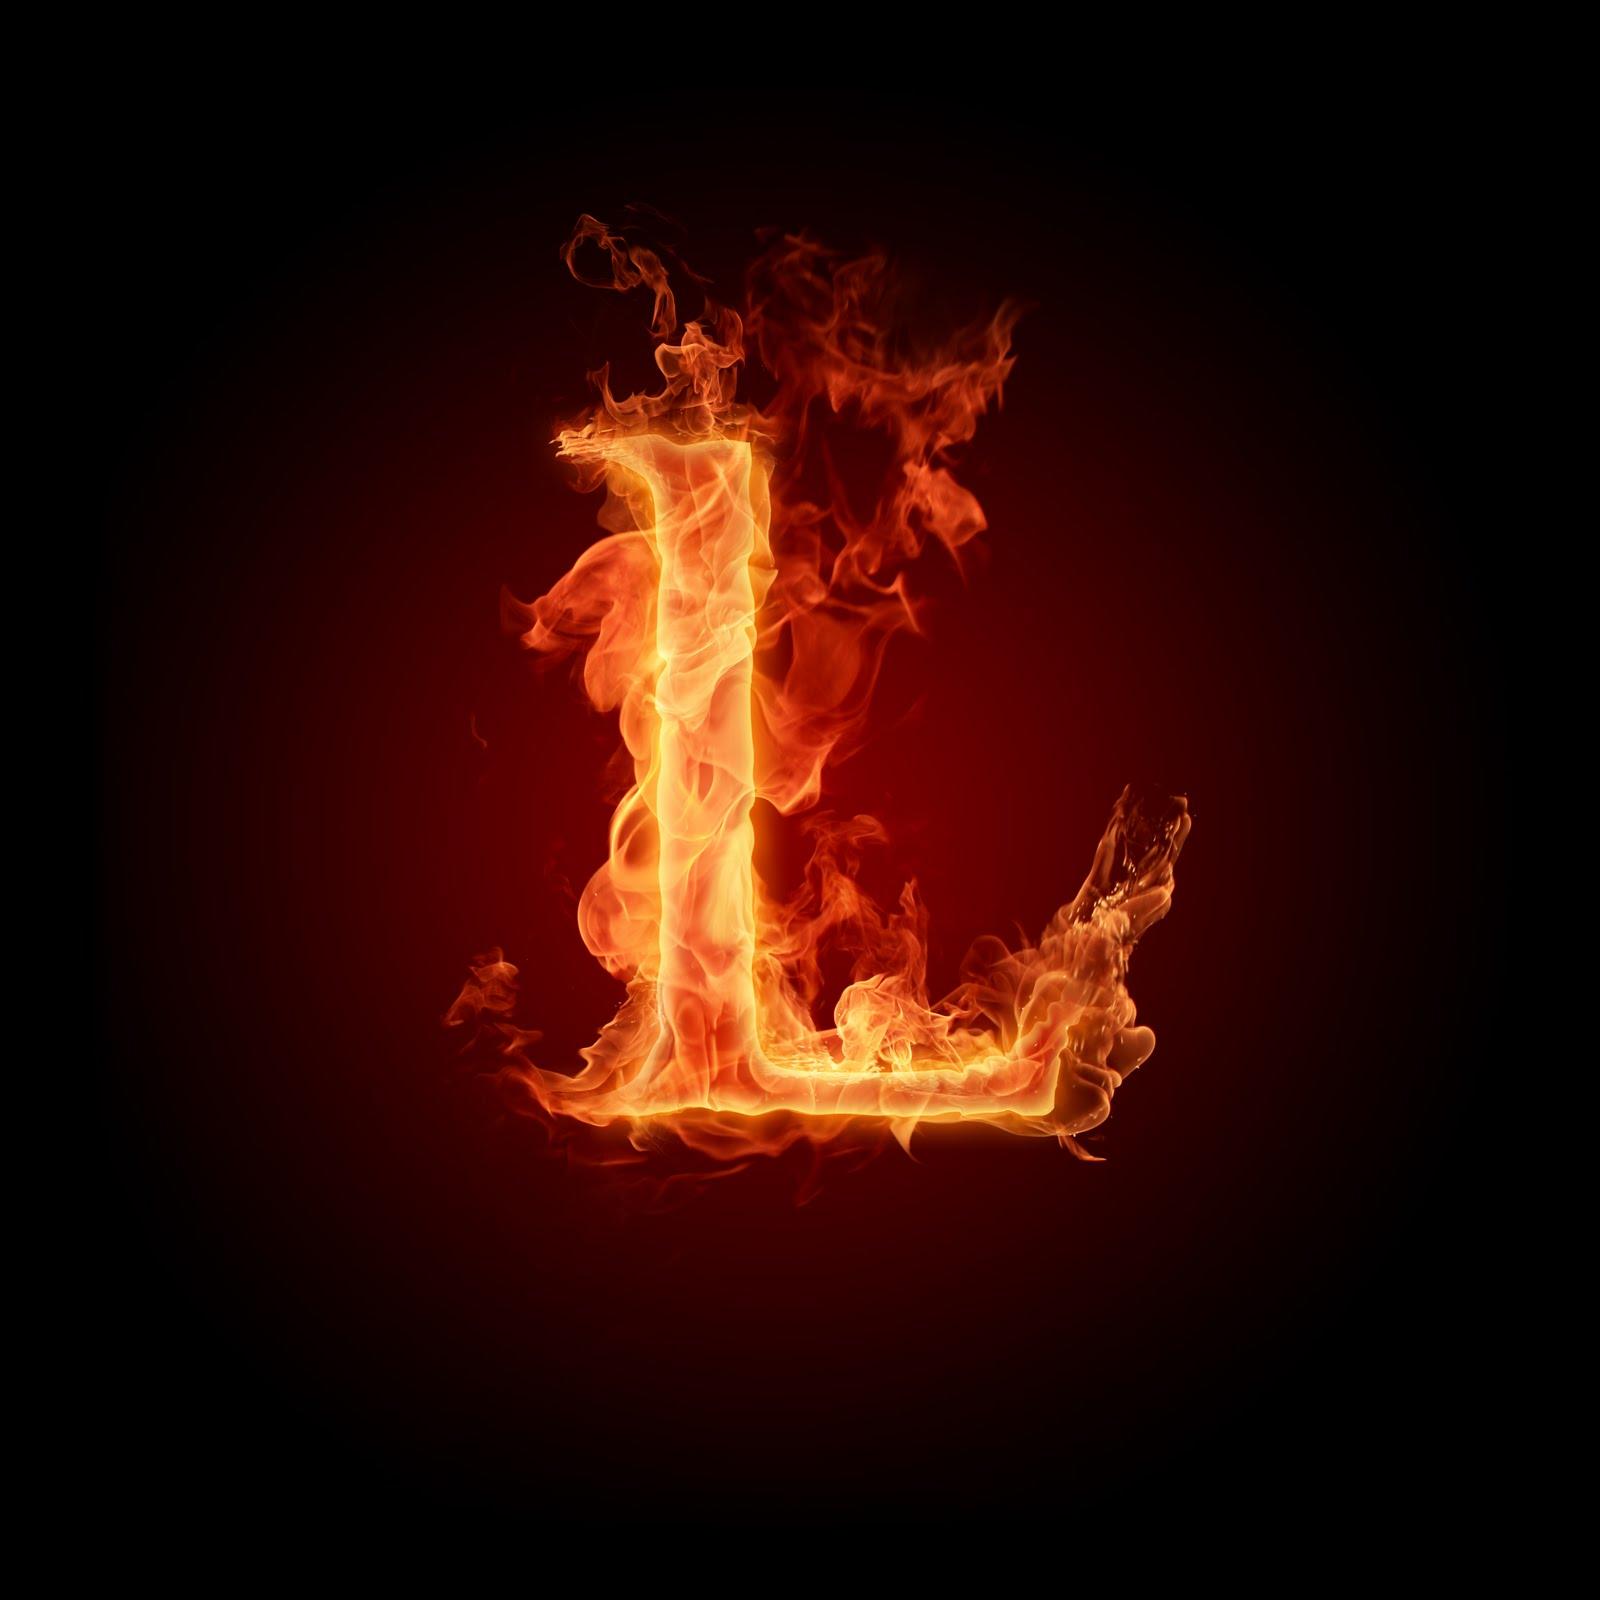 H Letter In Fire Hd coolbestpics: Fire let...